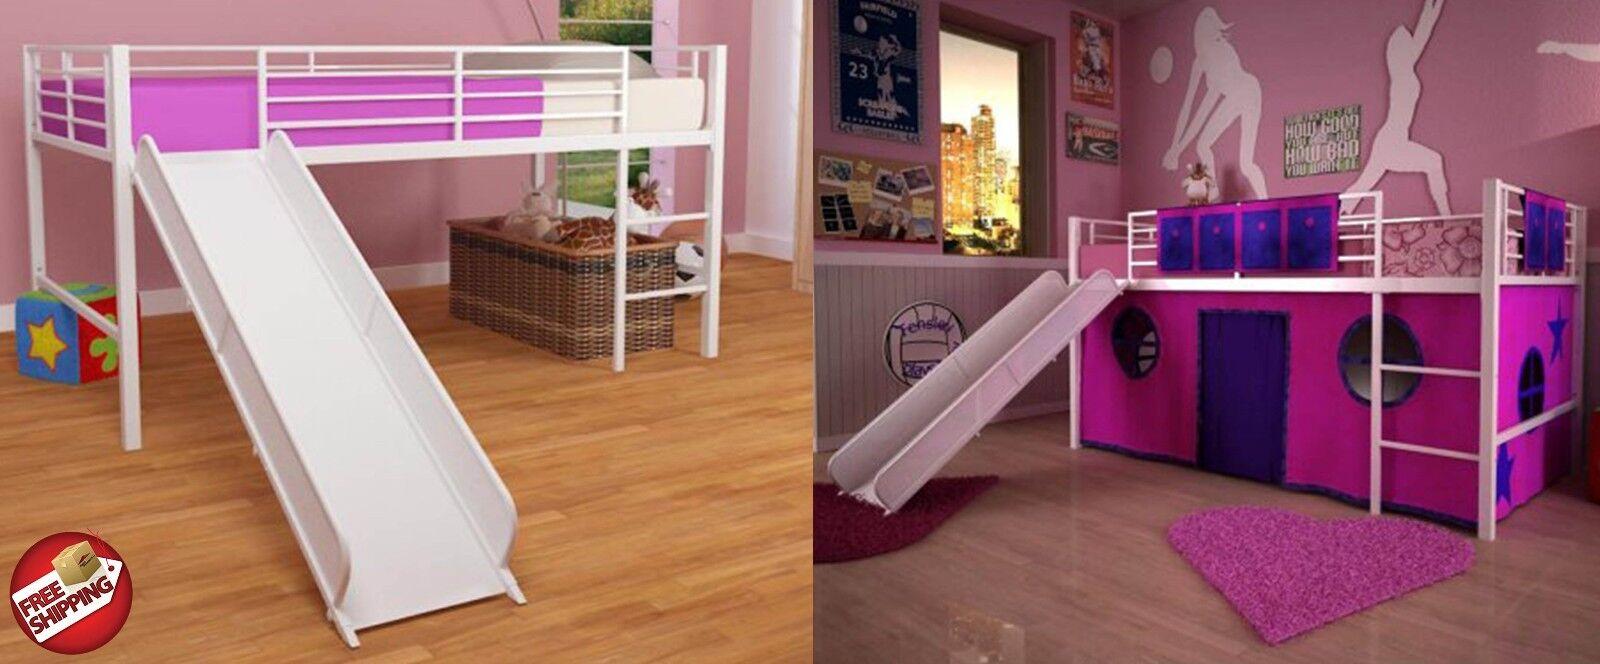 White Loft Bunk Bed Slide Twin Tent Kids Girls Fort Metal Fantasy Loftbed Pink Ebay